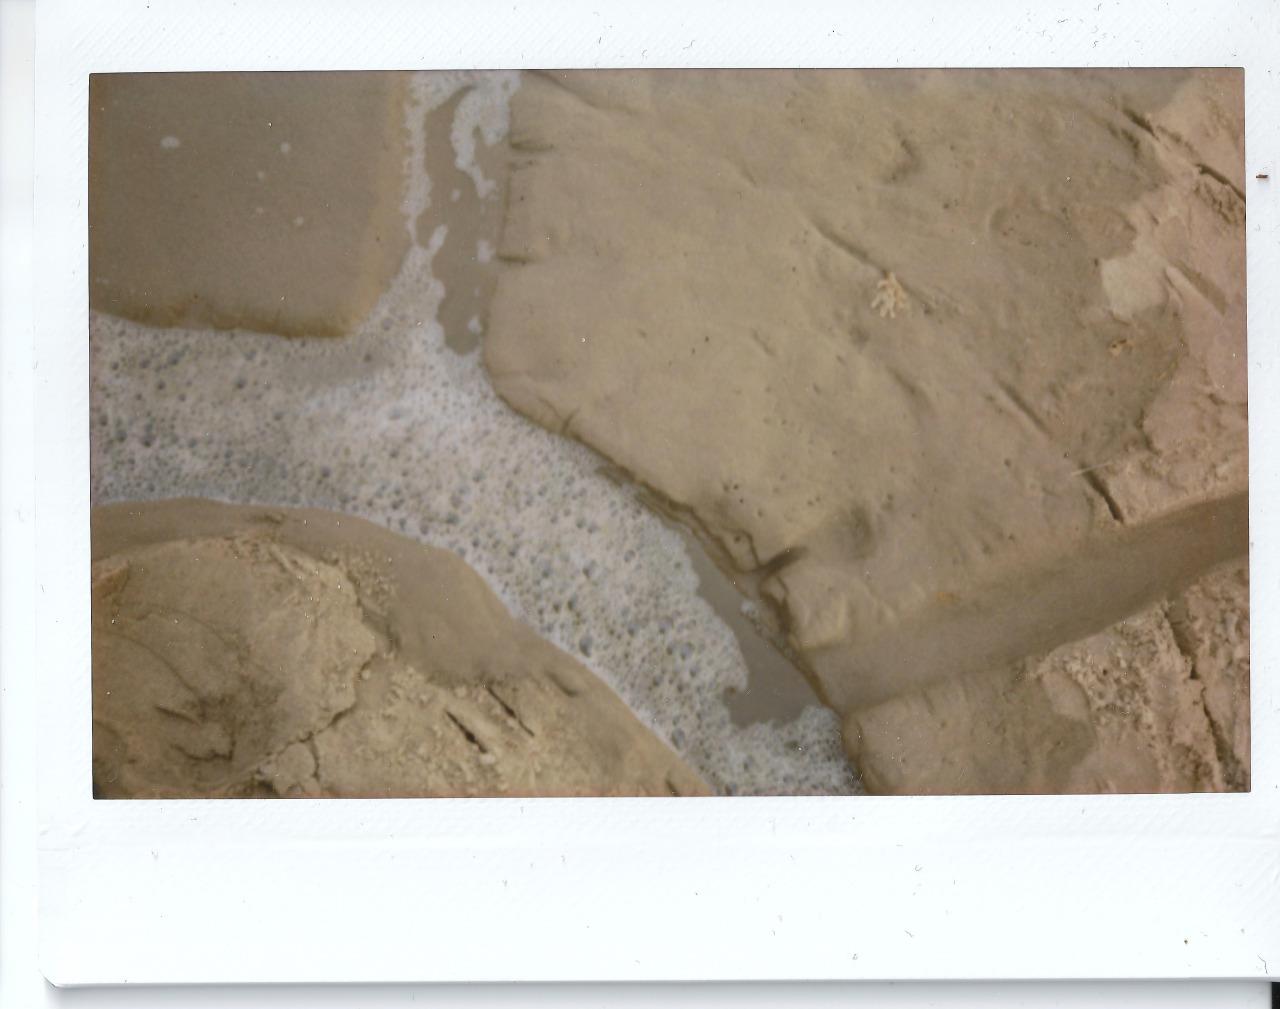 Polaroid 2 - Artefact 1.1